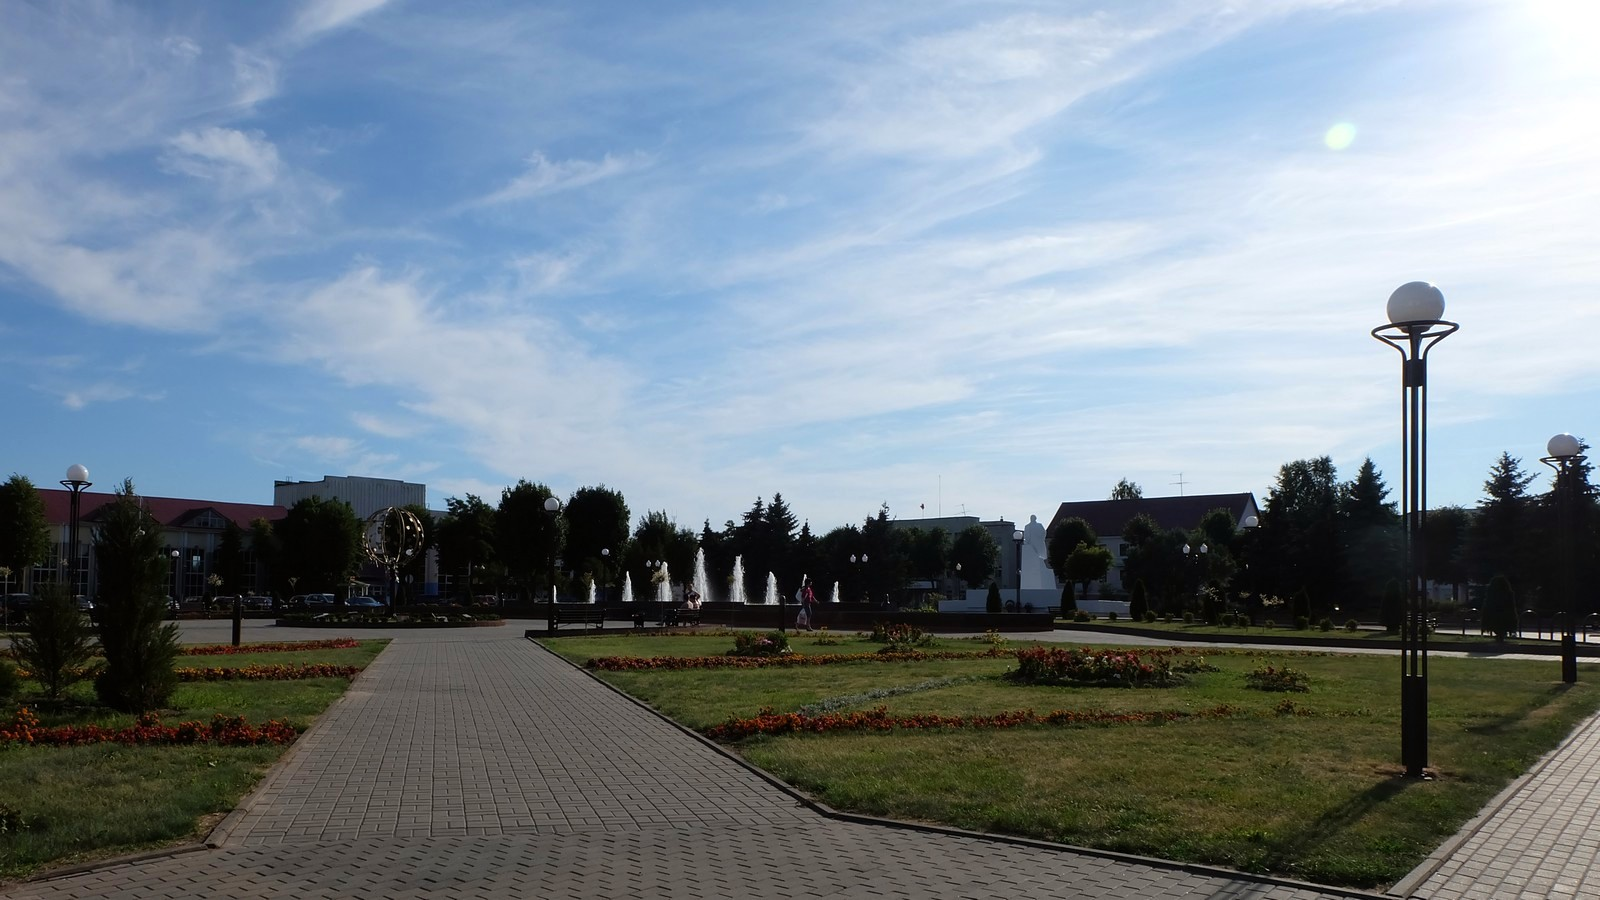 Центральная площадь, Вилейка, Беларусь